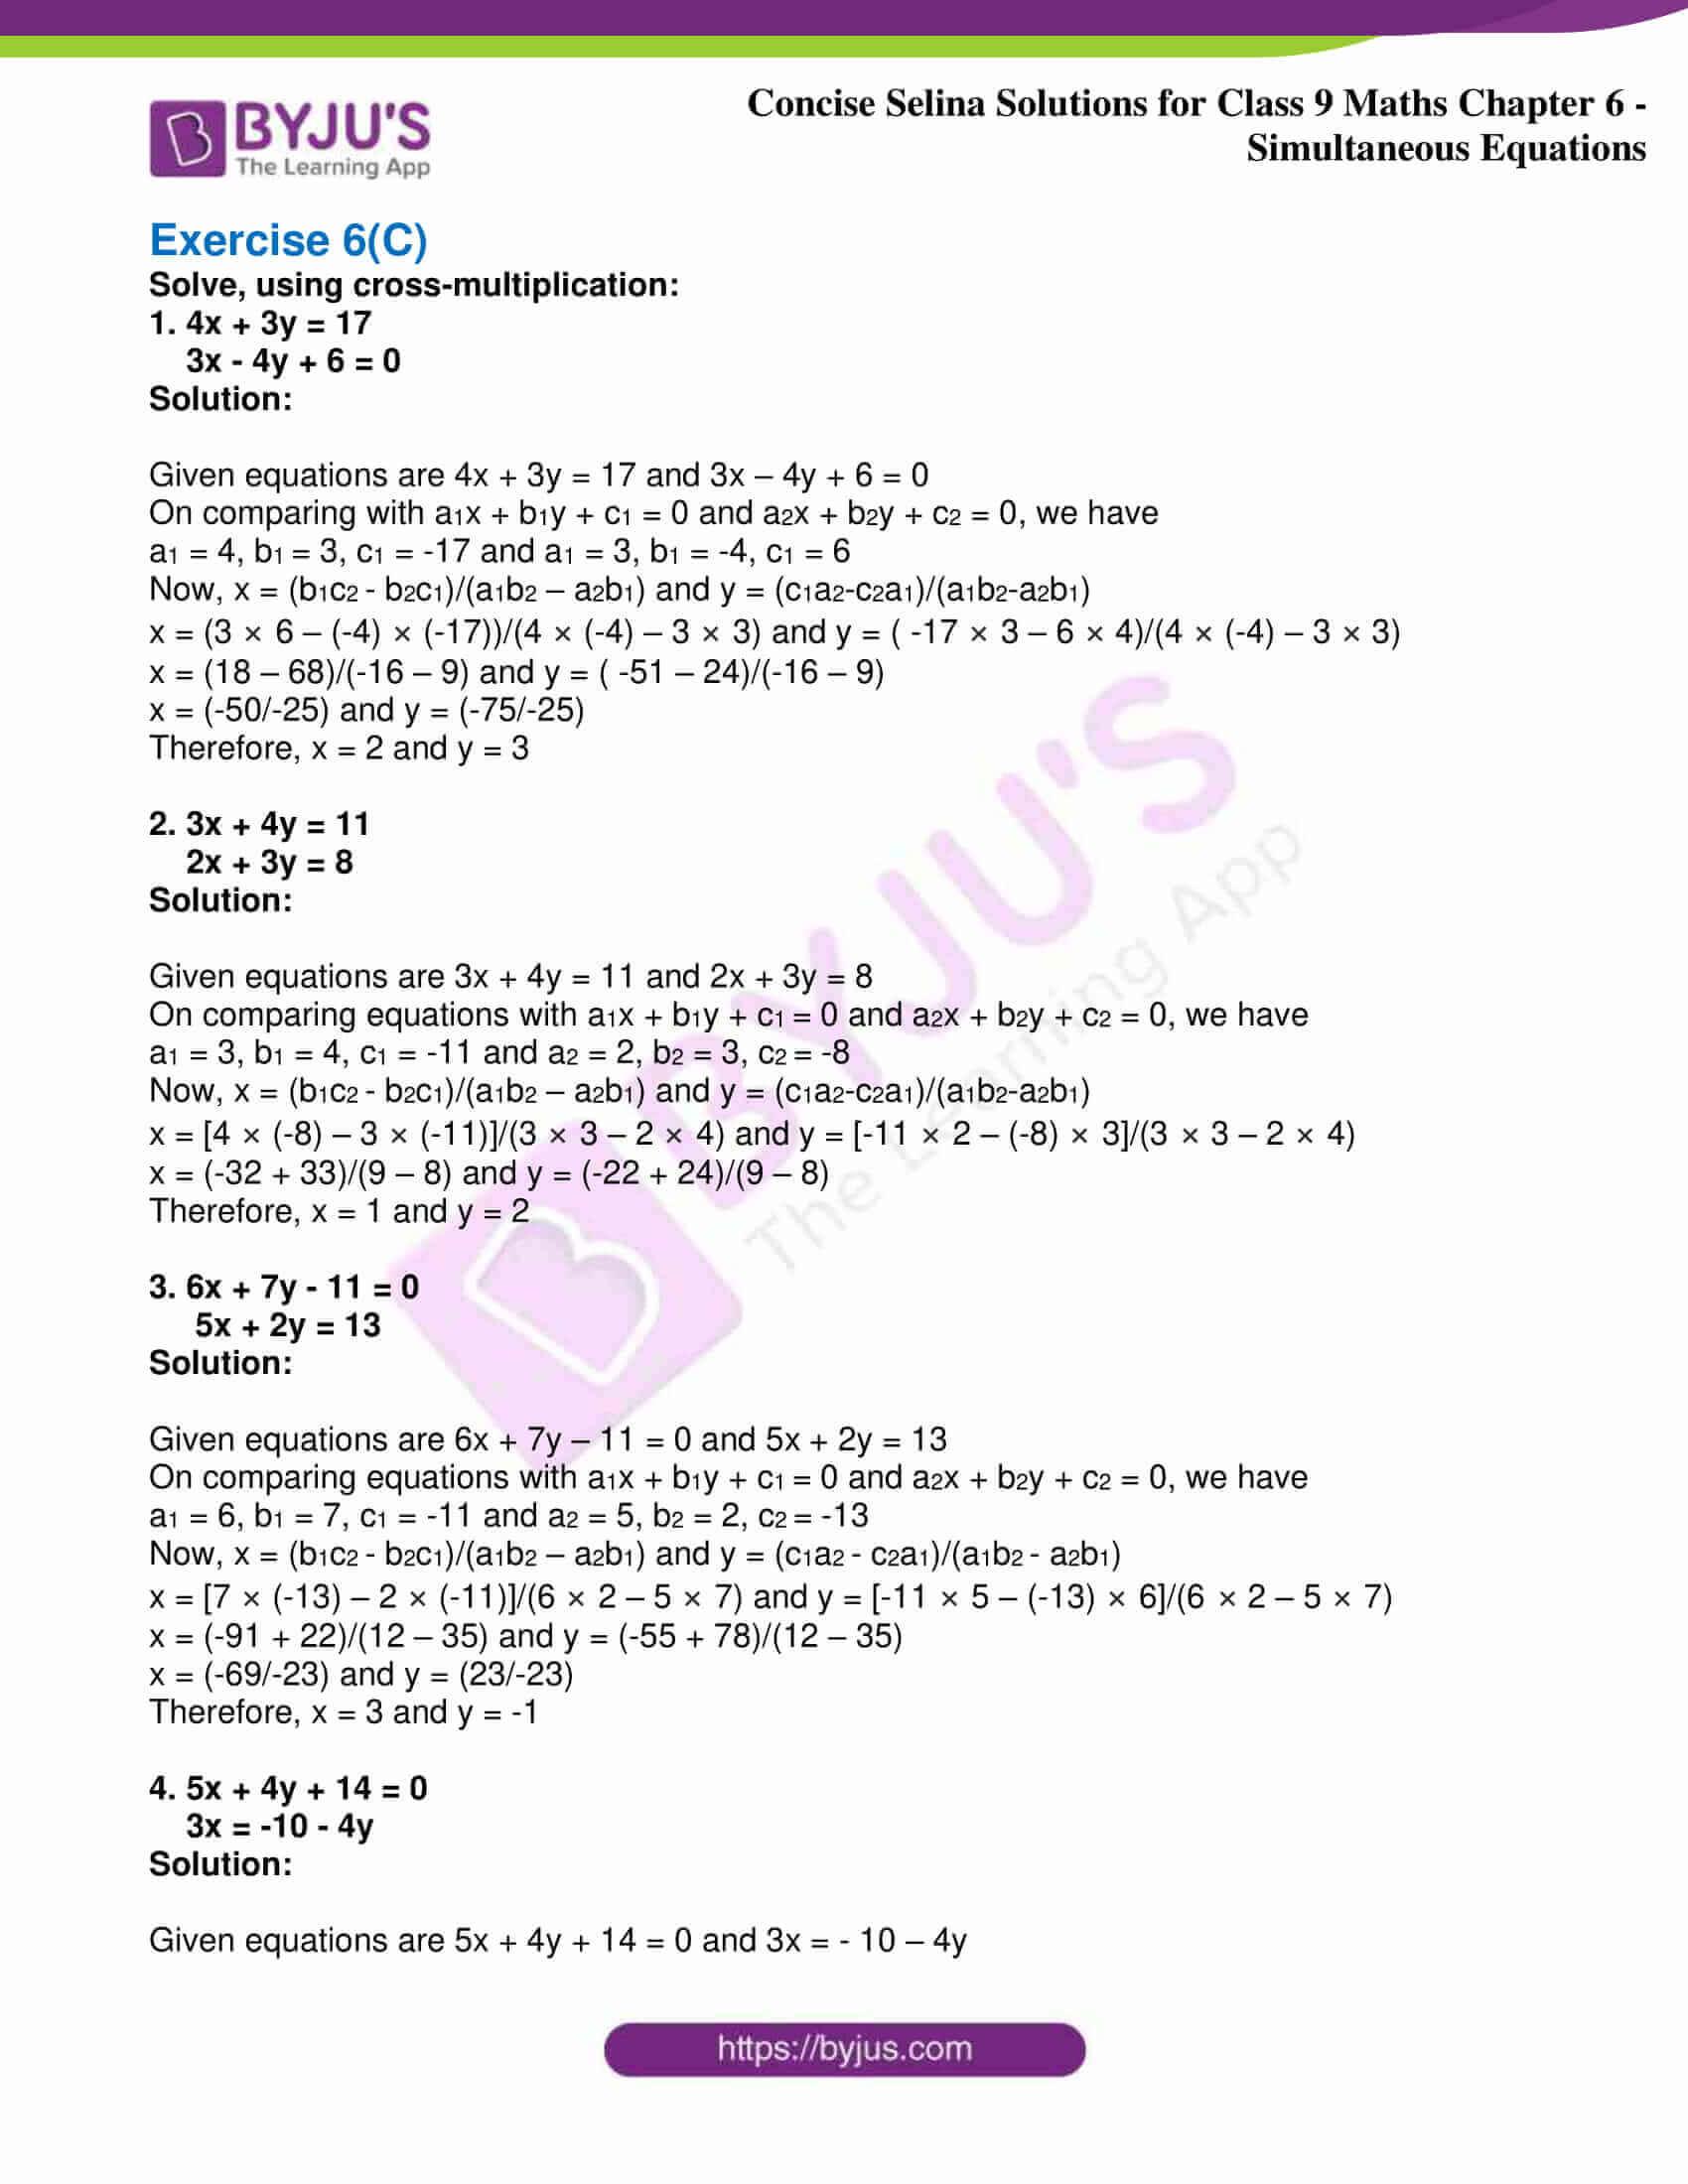 icse class 9 jun7 maths selina solutions chapter 6 simultaneous equations 20